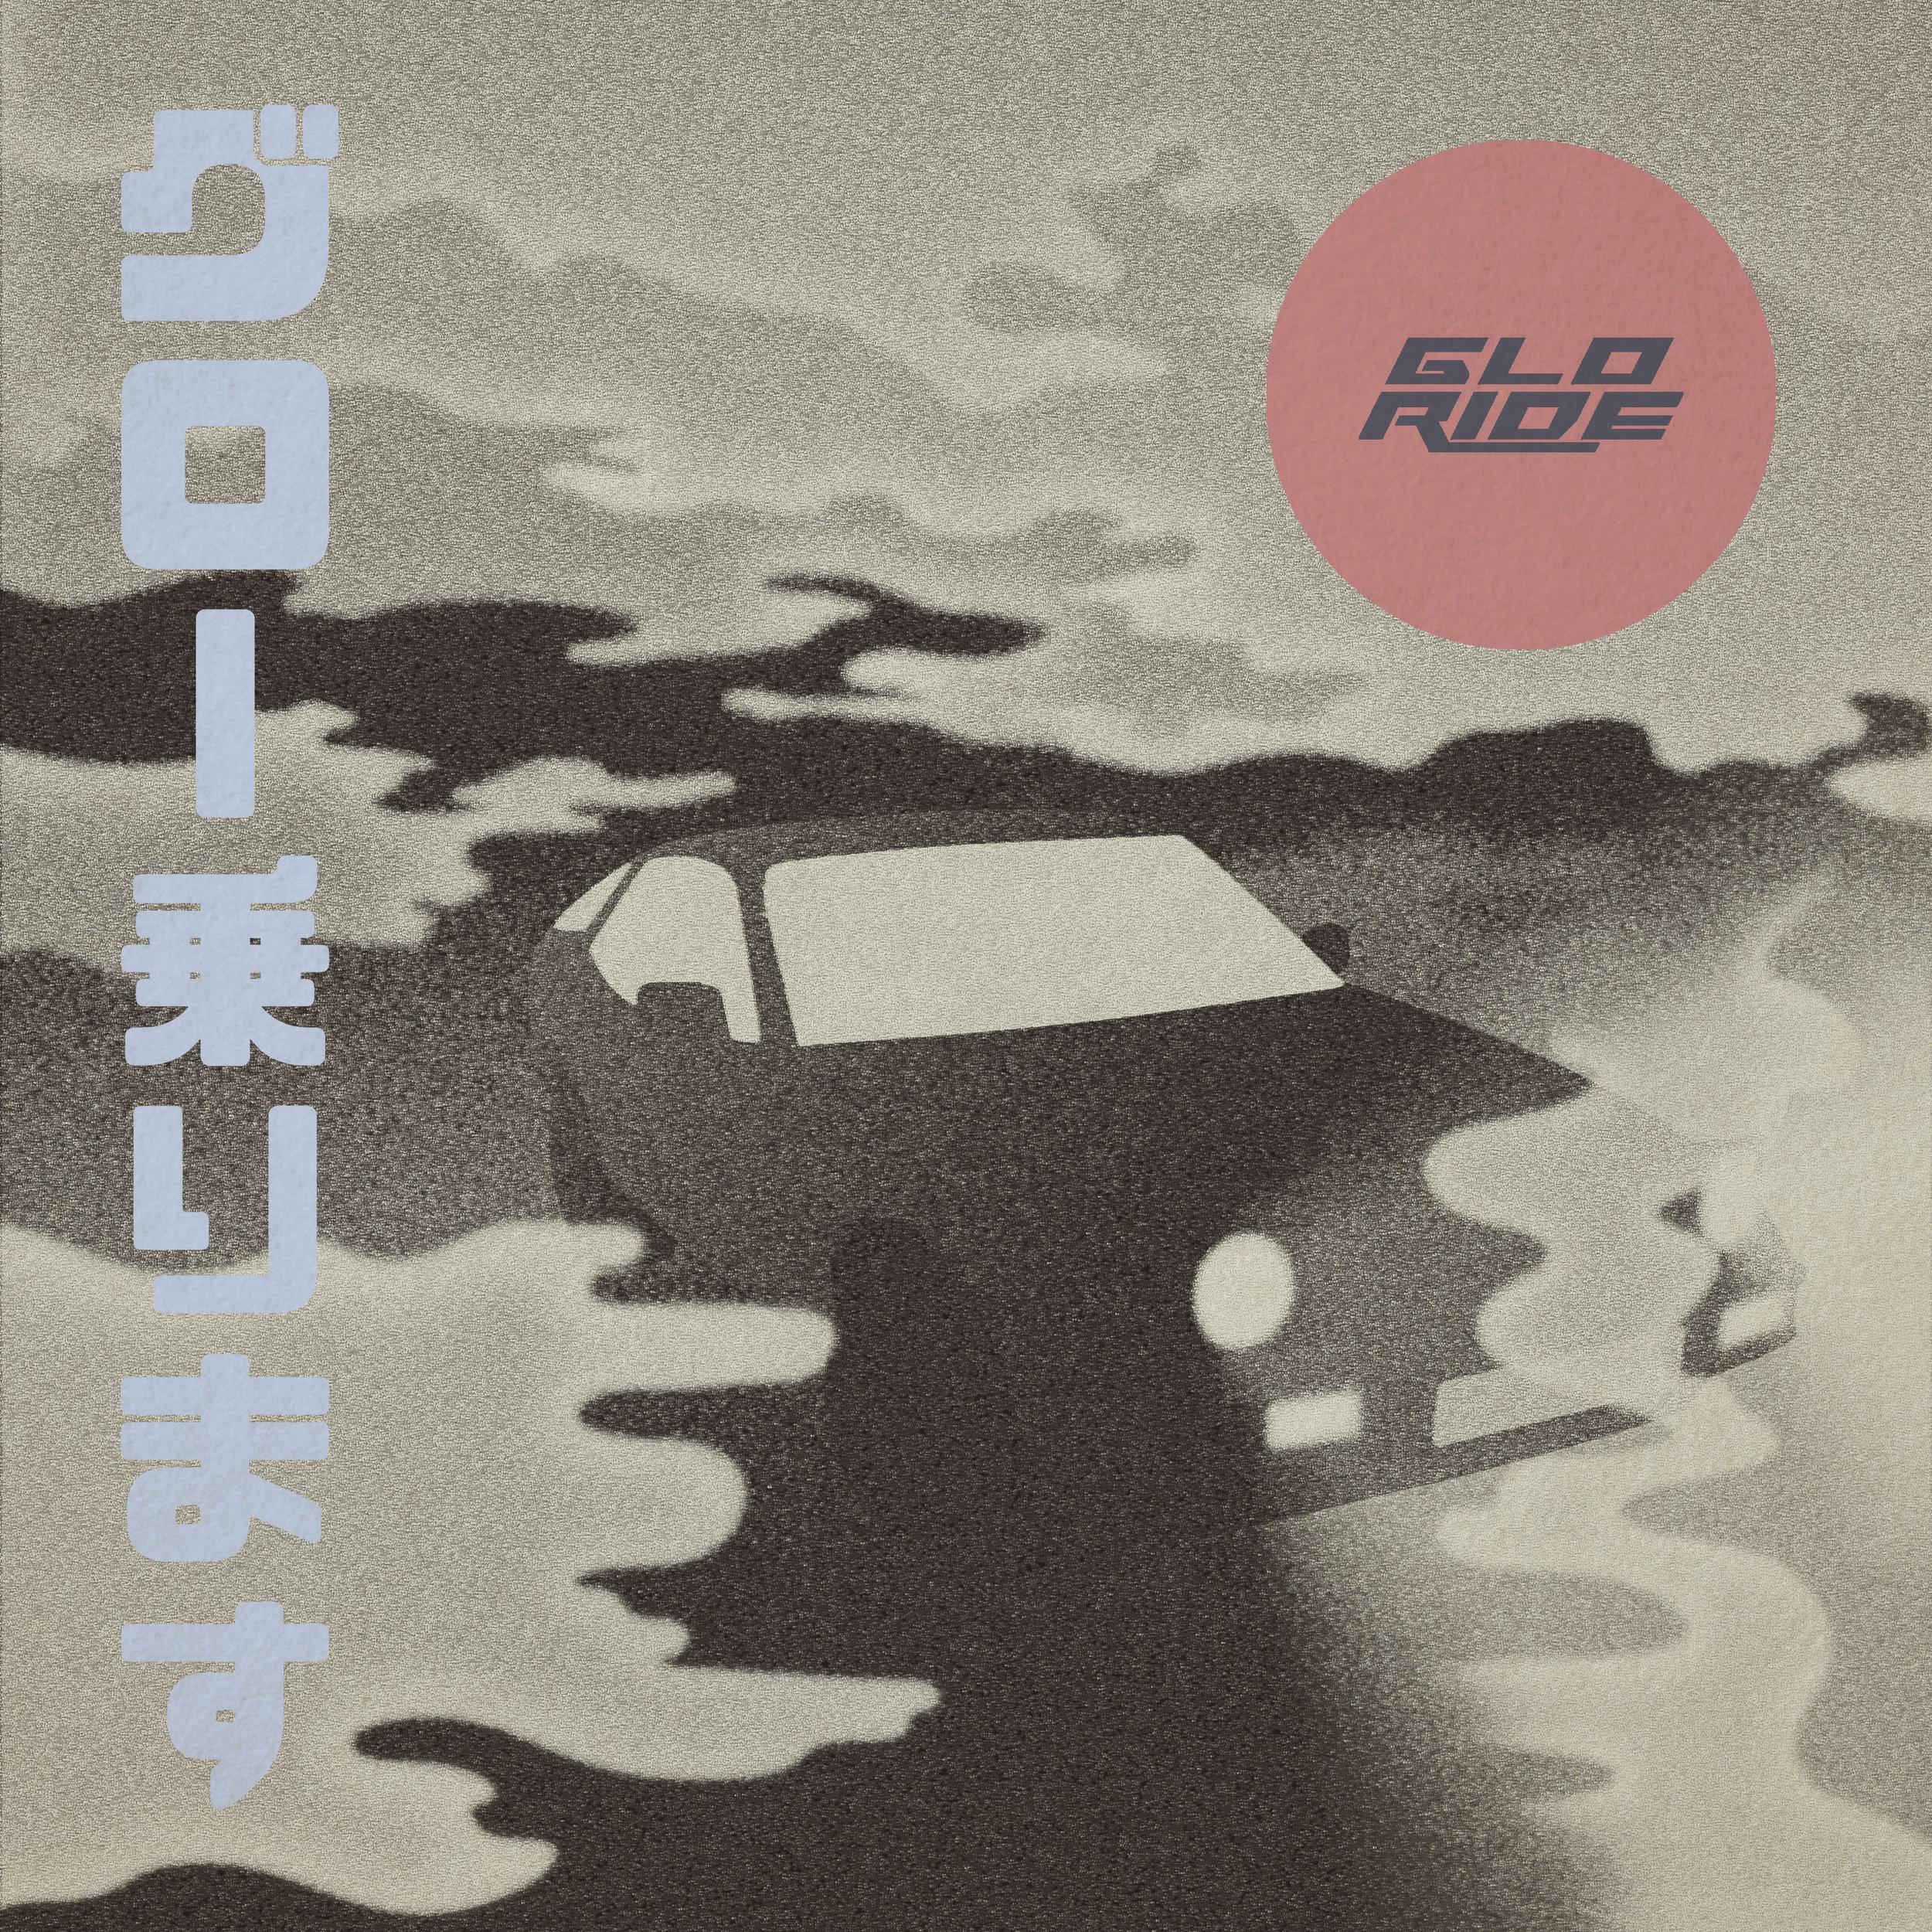 Glo Ride - Hot Flash Heat Wave